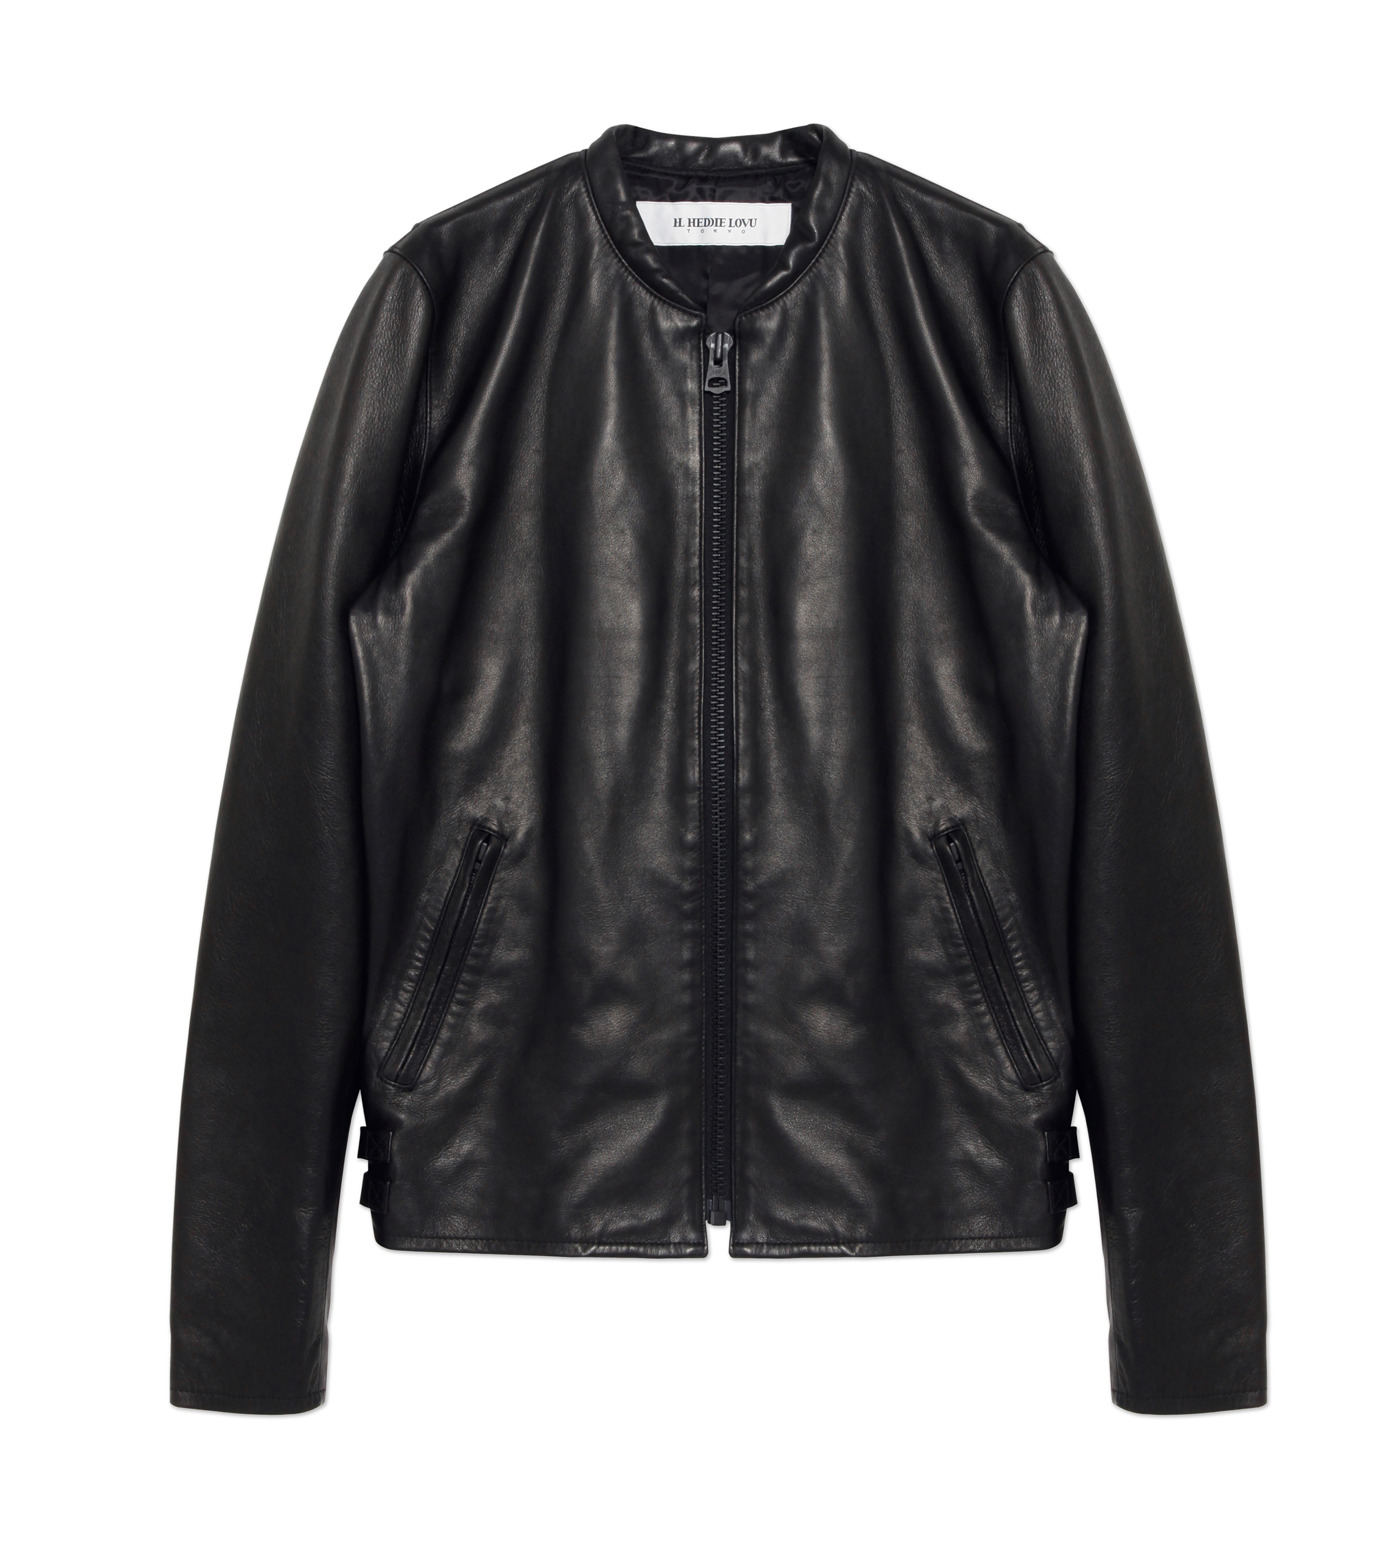 HL HEDDIE LOVU(エイチエル・エディールーヴ)のMINIMUM COLLAR LEATHER JACKET-BLACK(ジャケット/jacket)-18S94006-13 拡大詳細画像1